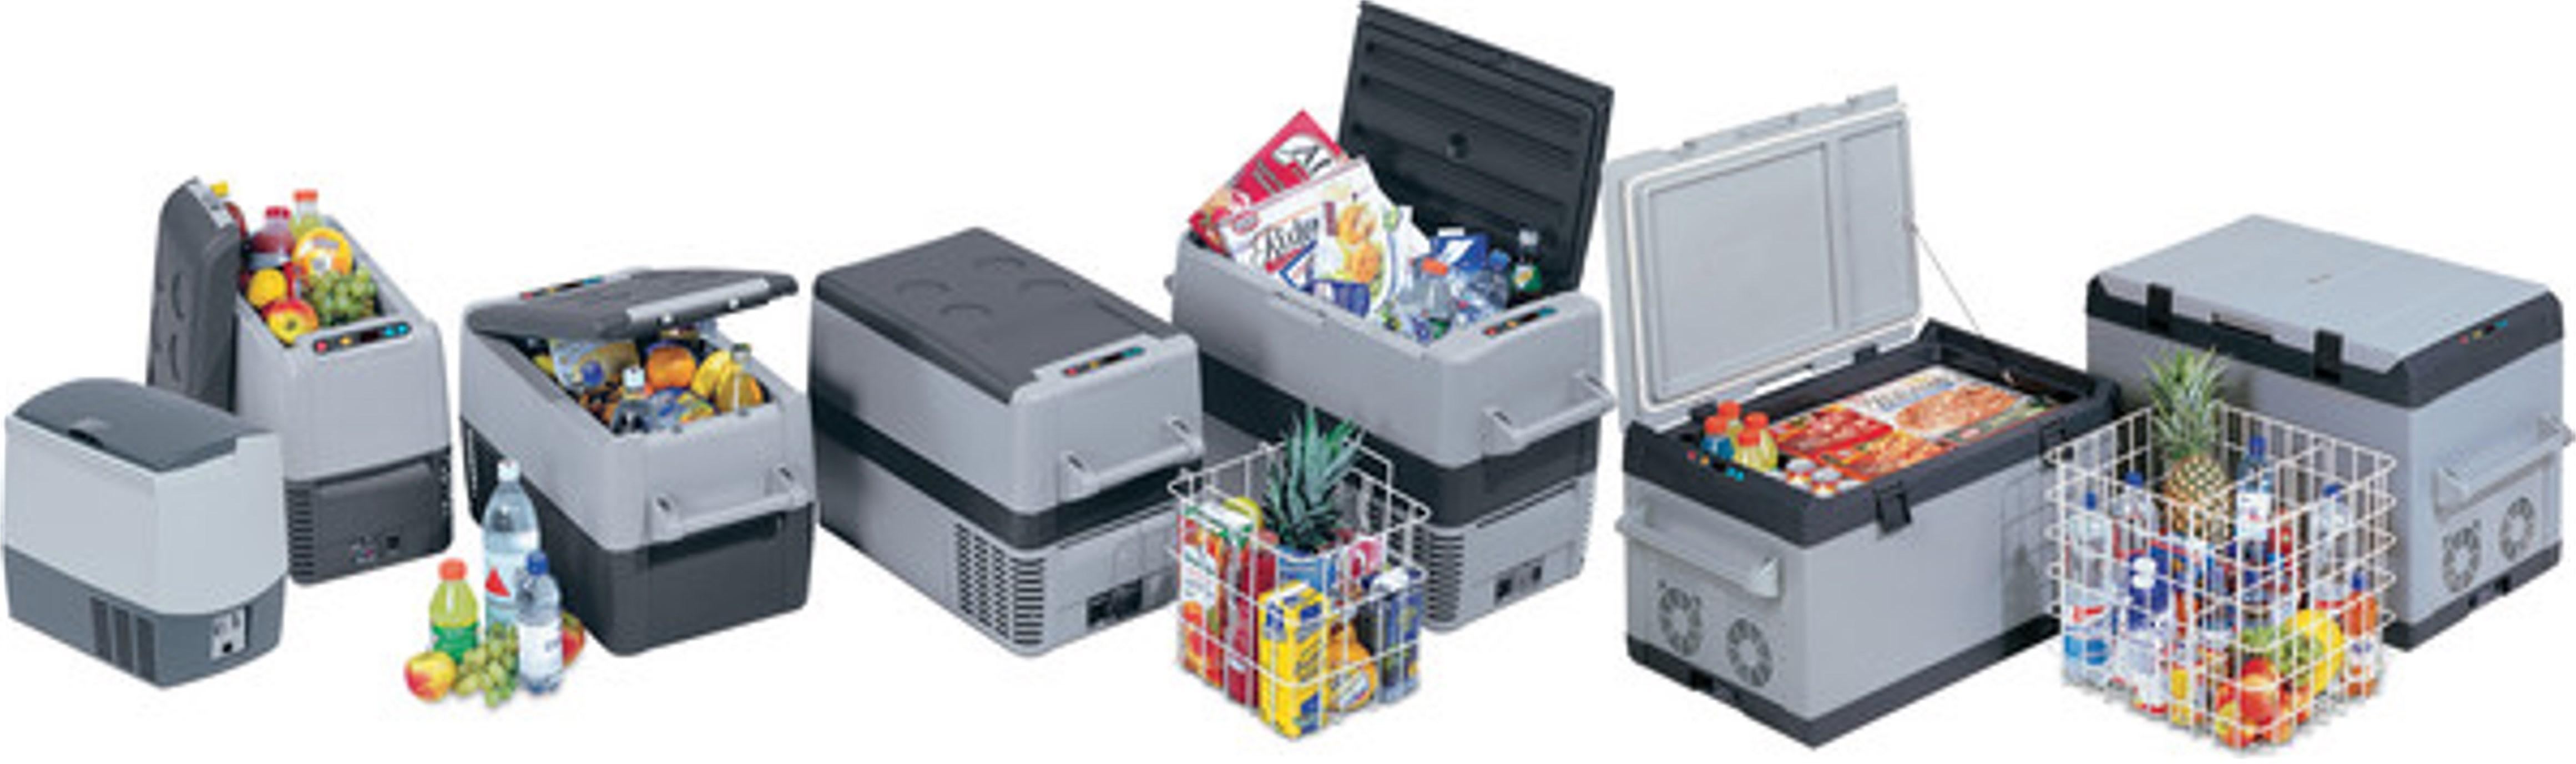 Dometic CF-050AC110 Portable Freezer/Refrigerator Most Popular, Gray